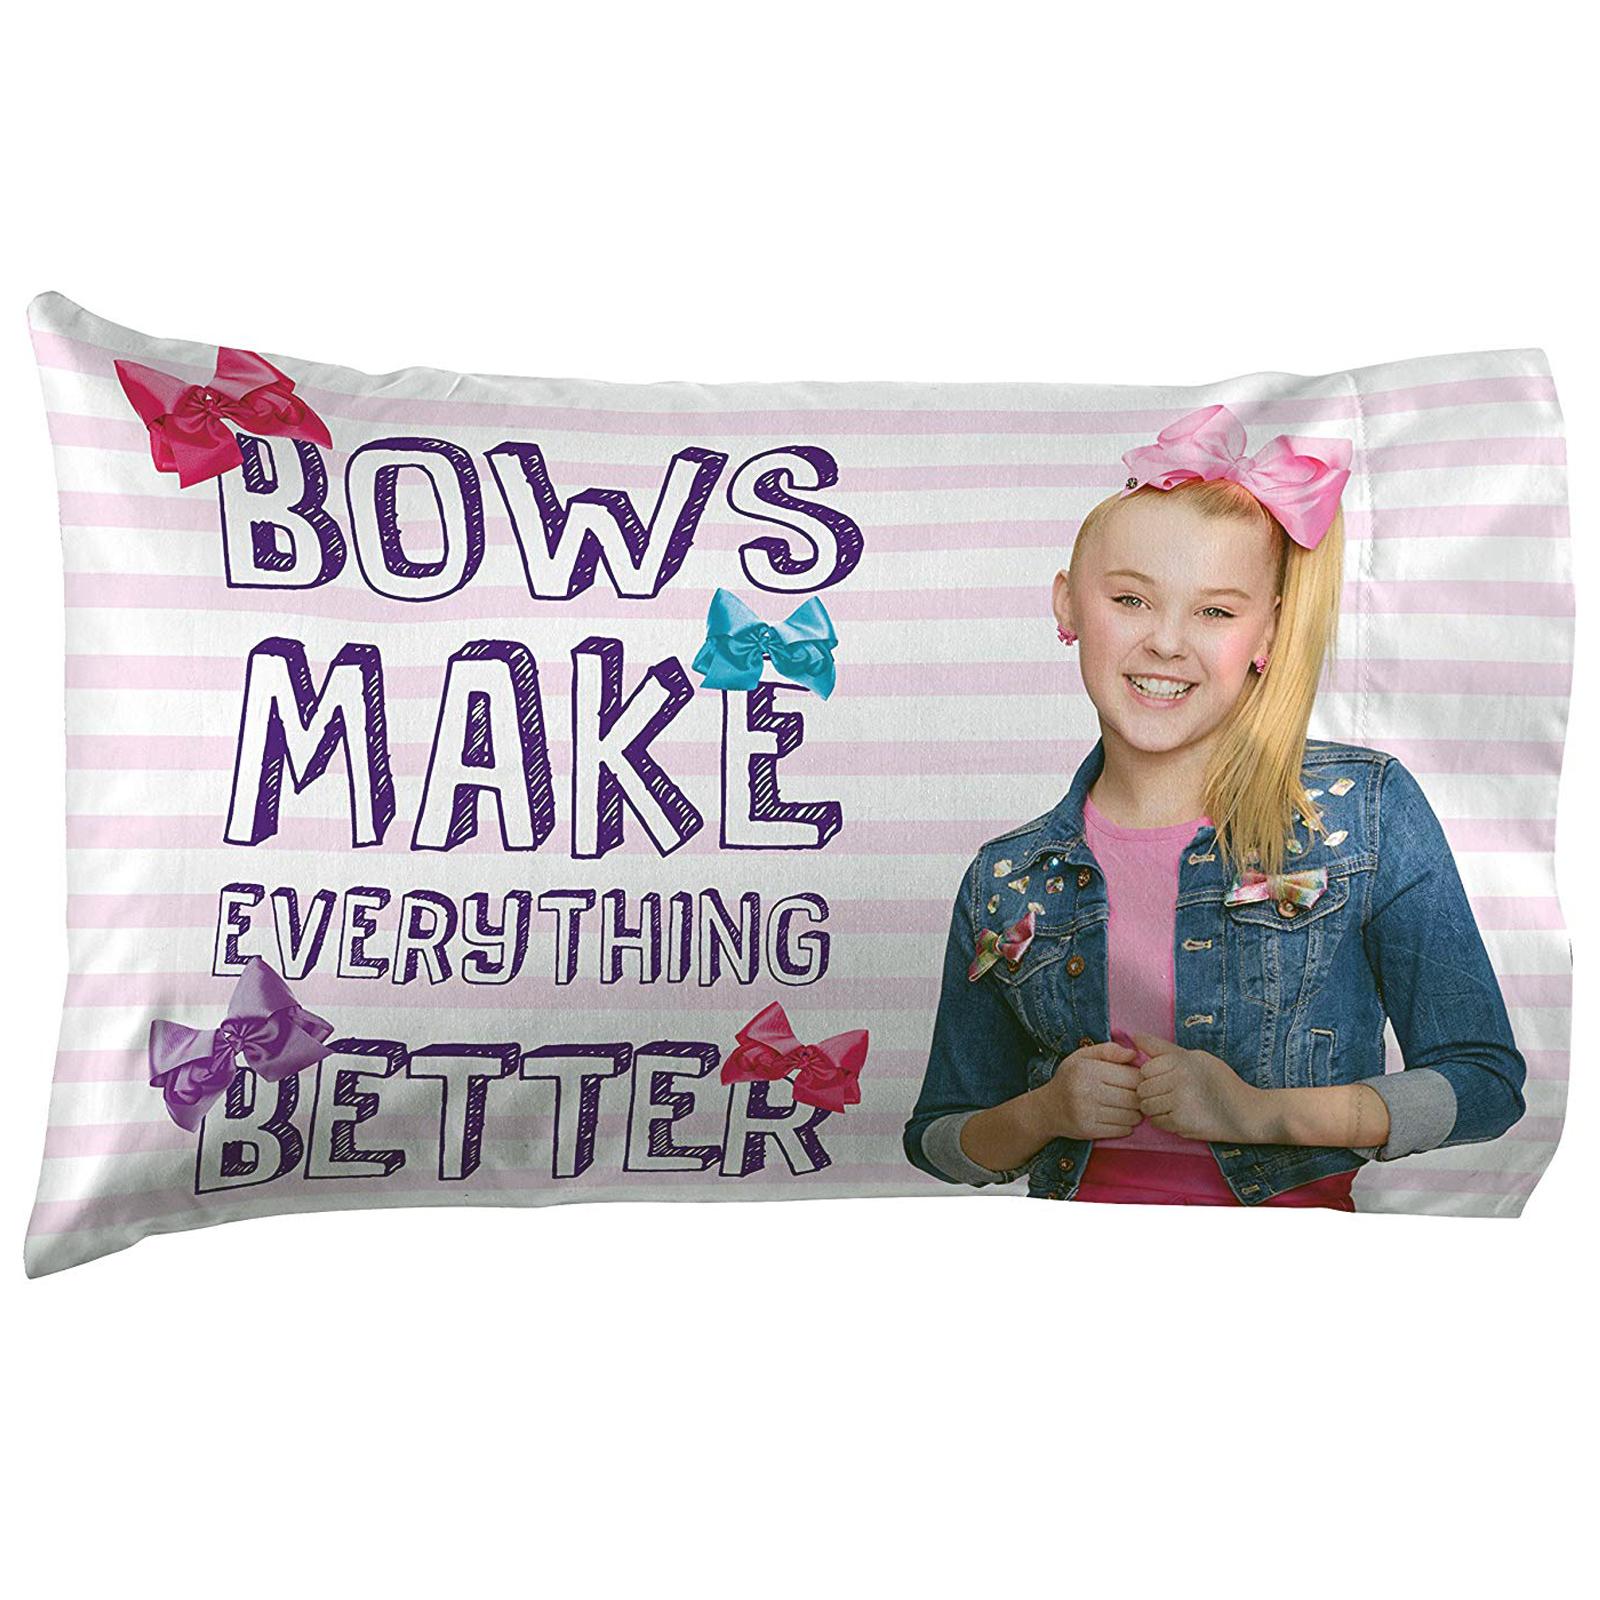 JoJo Siwa Girls Twin Size Sheet Set with Pillow Case